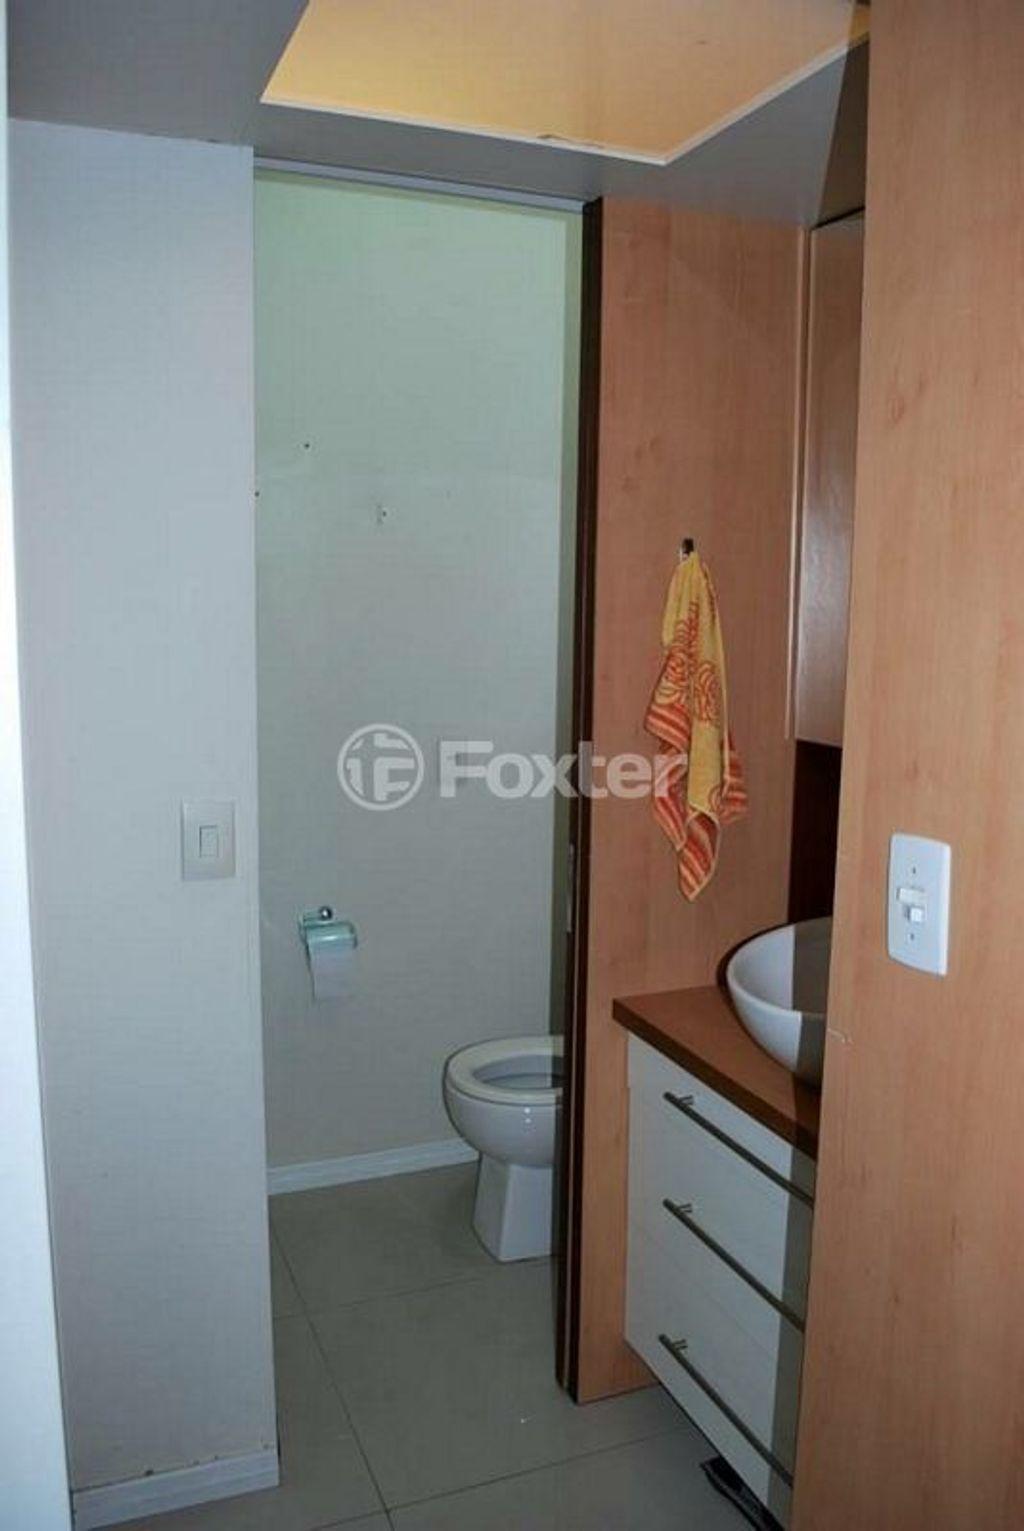 Cobertura 1 Dorm, Santana, Porto Alegre (137528) - Foto 13